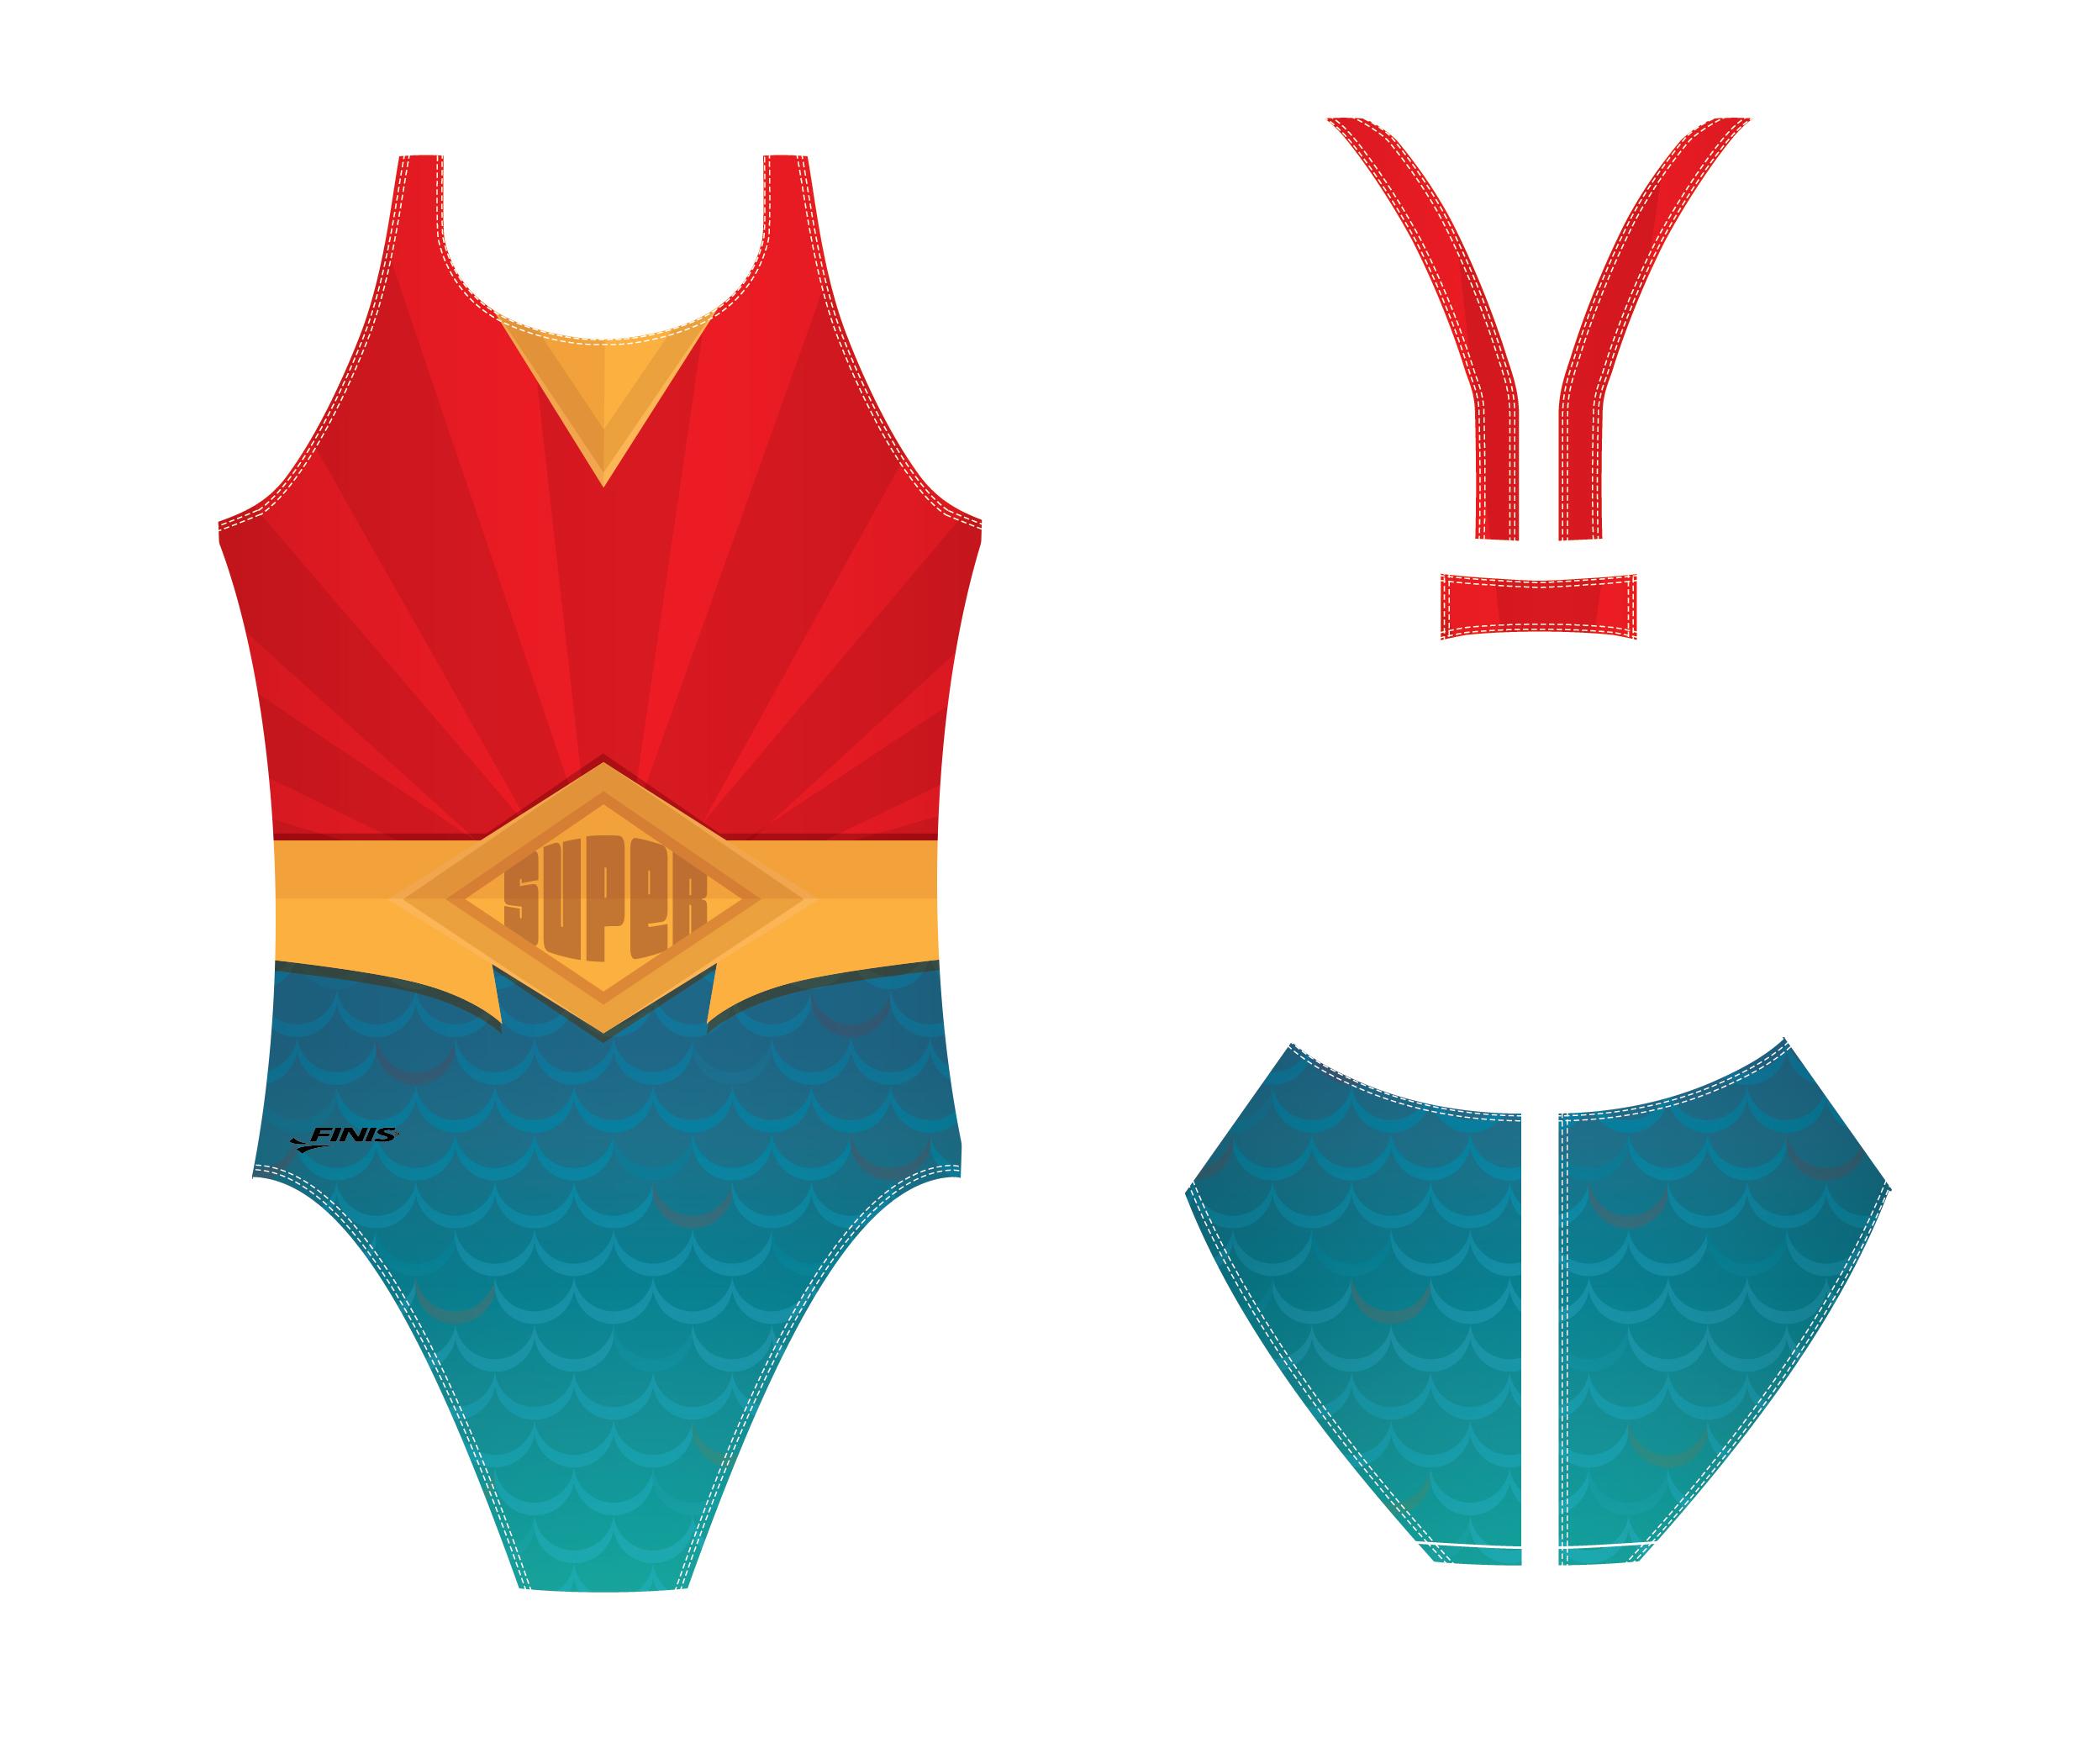 25x50swim-Bladeback-Design-SuperHero-Mask.jpg